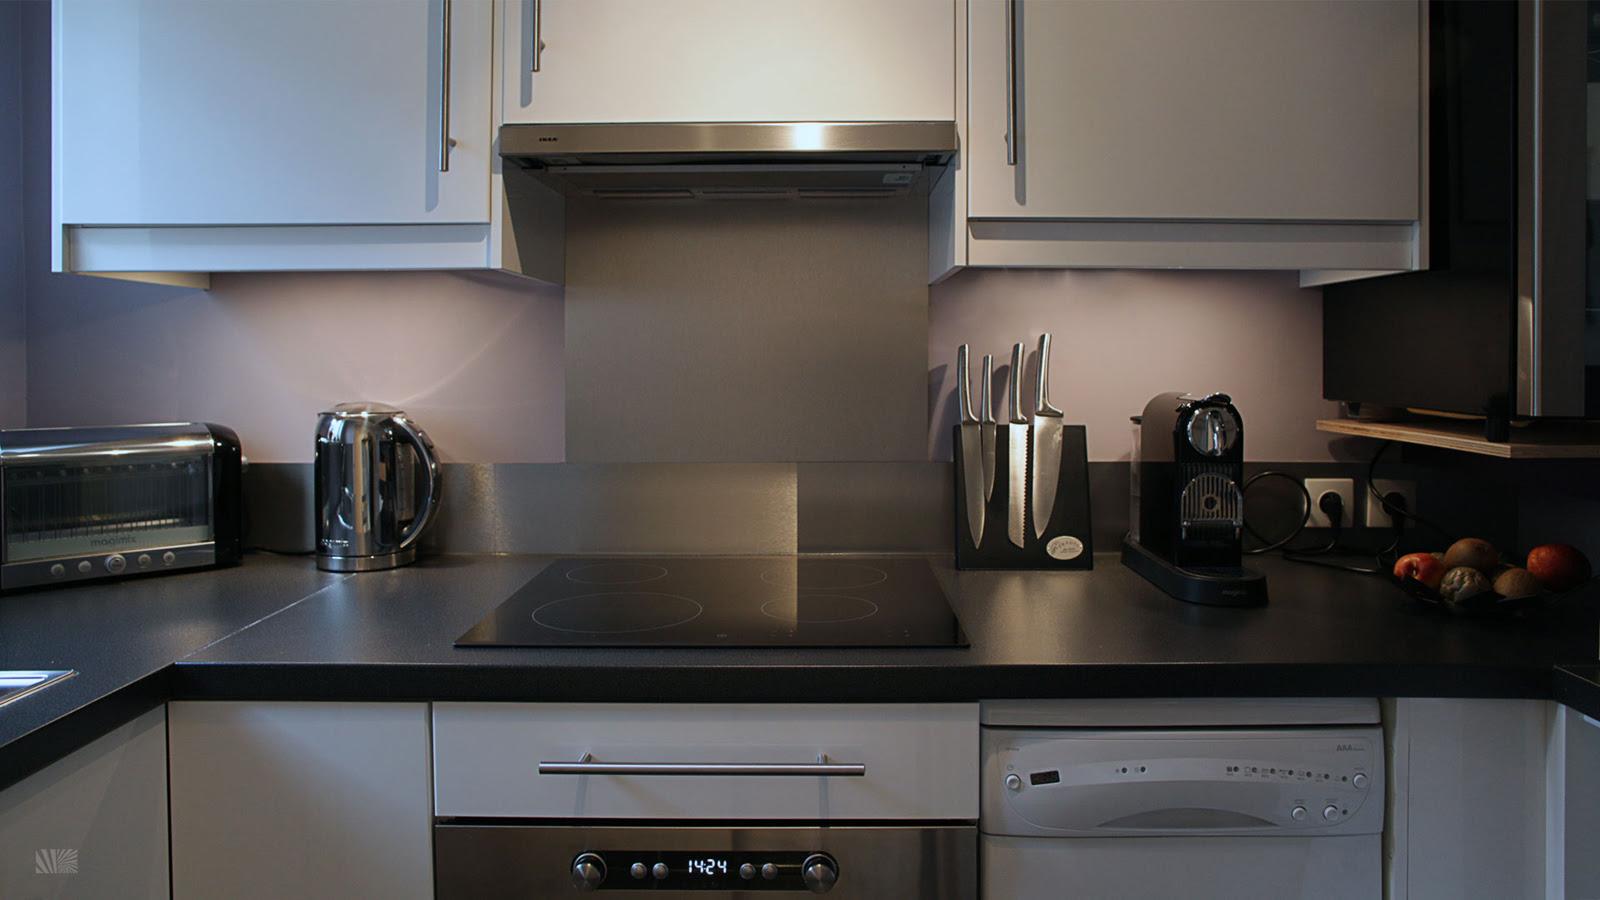 Stylish IKEA Kitchen For Small Space | iDesignArch | Interior ...